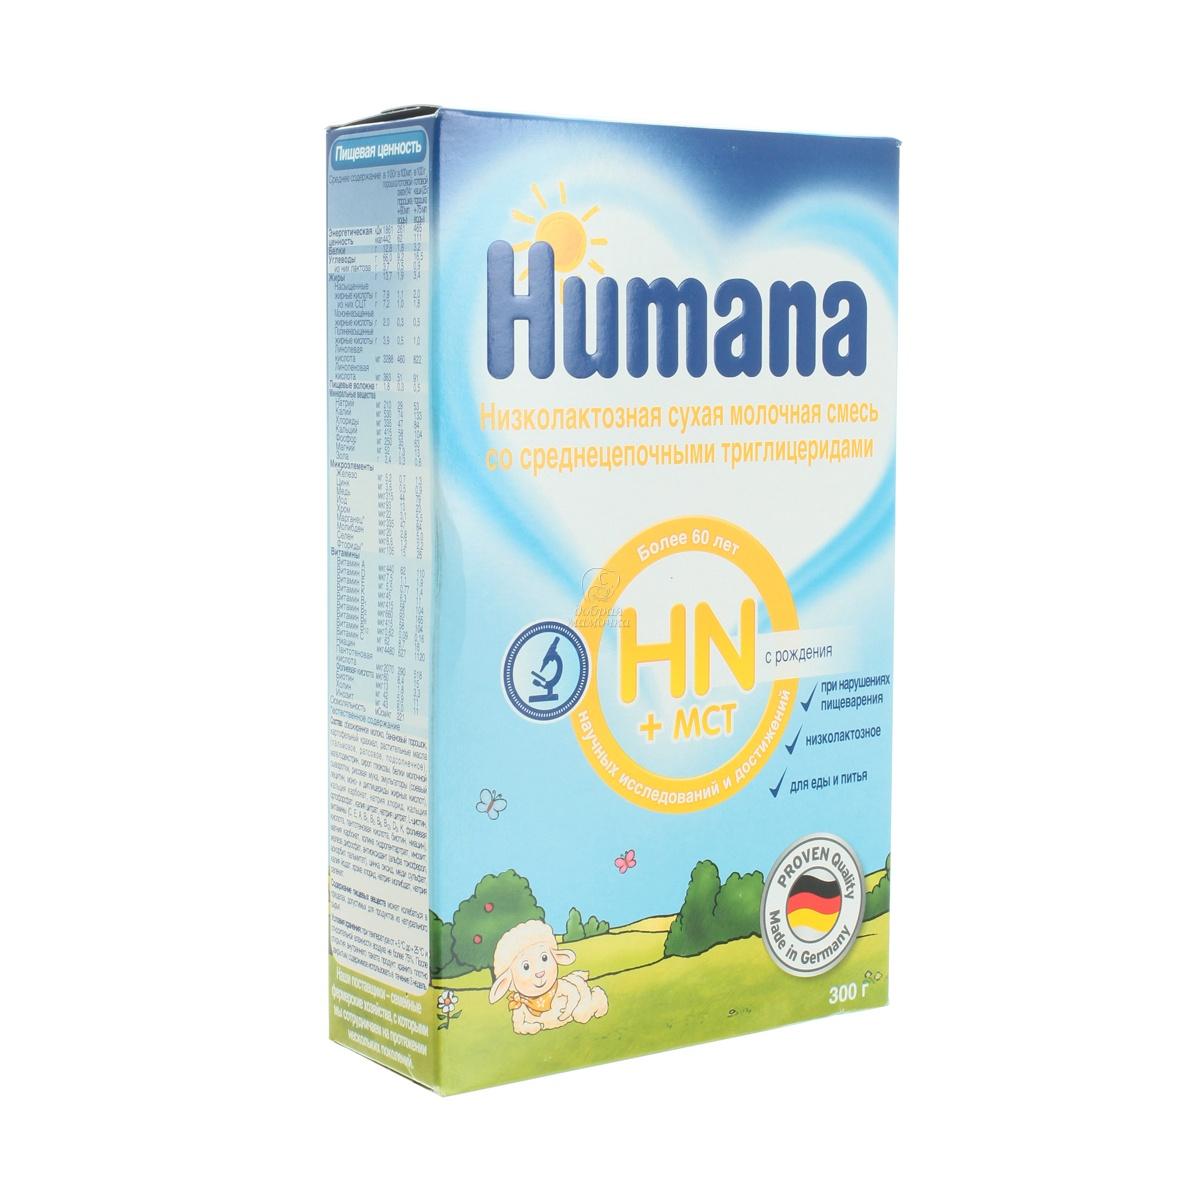 ���������� Humana �� + ��� 300 �� � 6 ���